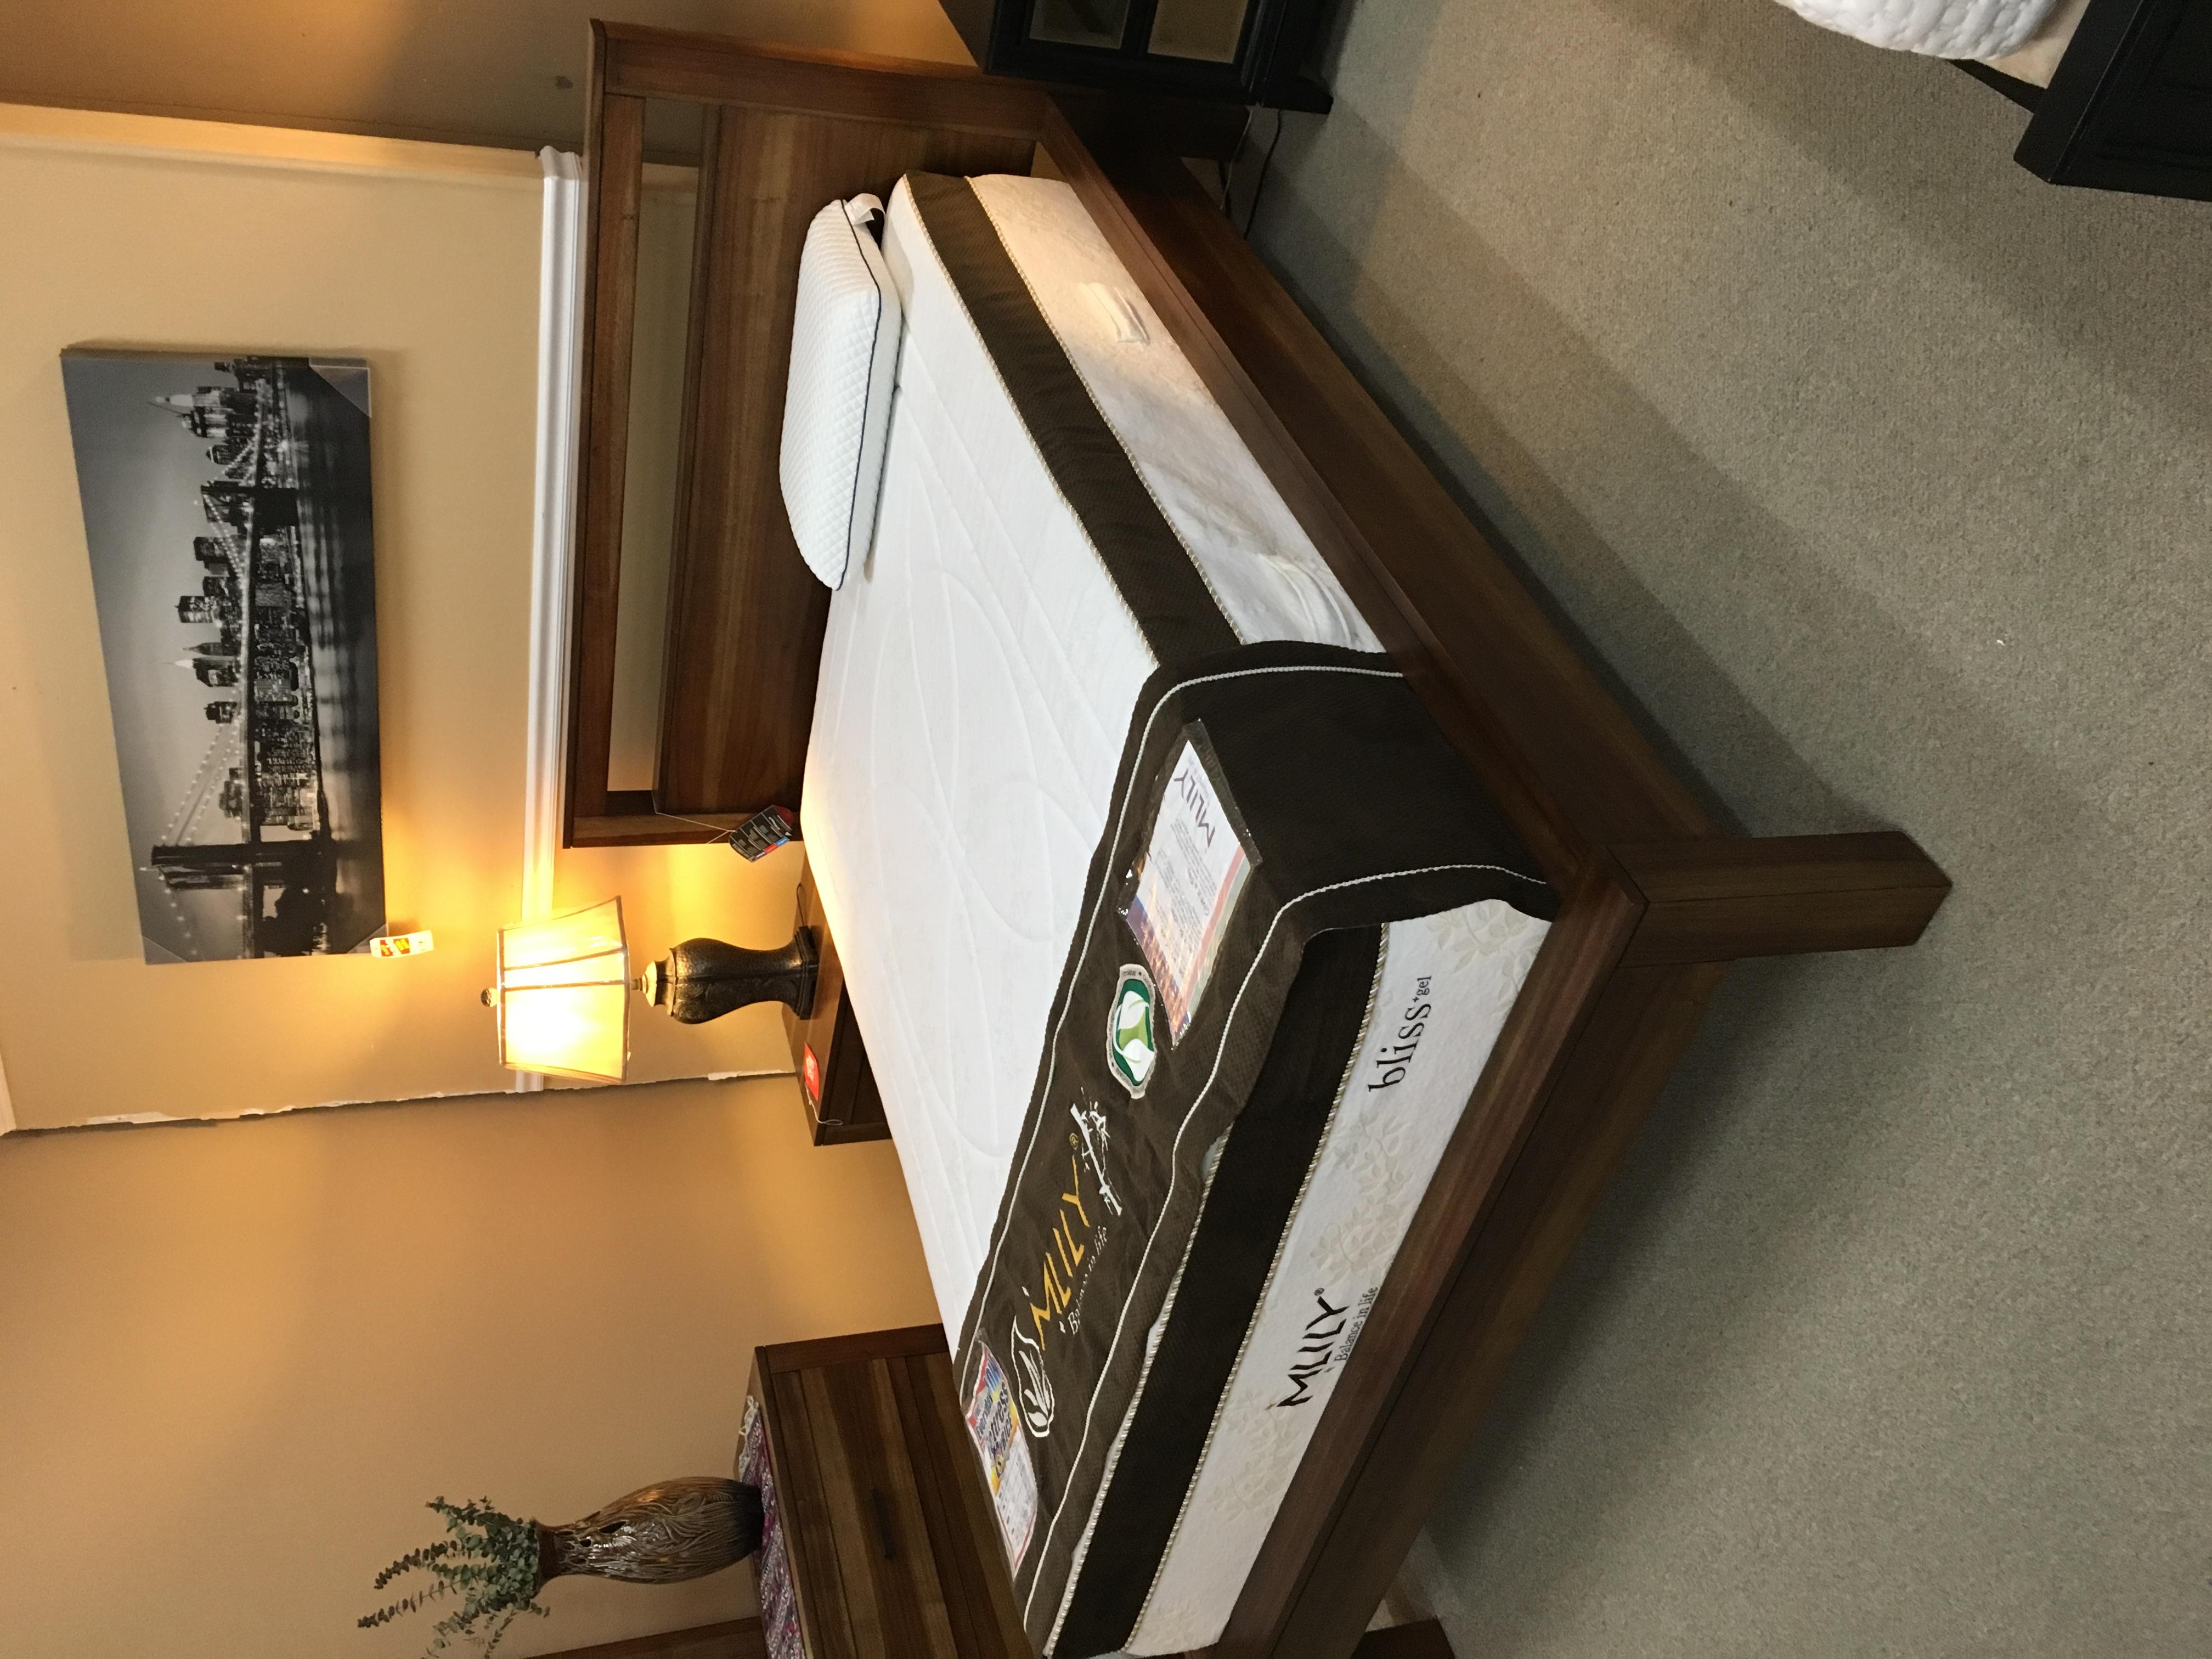 CST Rustic Bed 203651Q $470